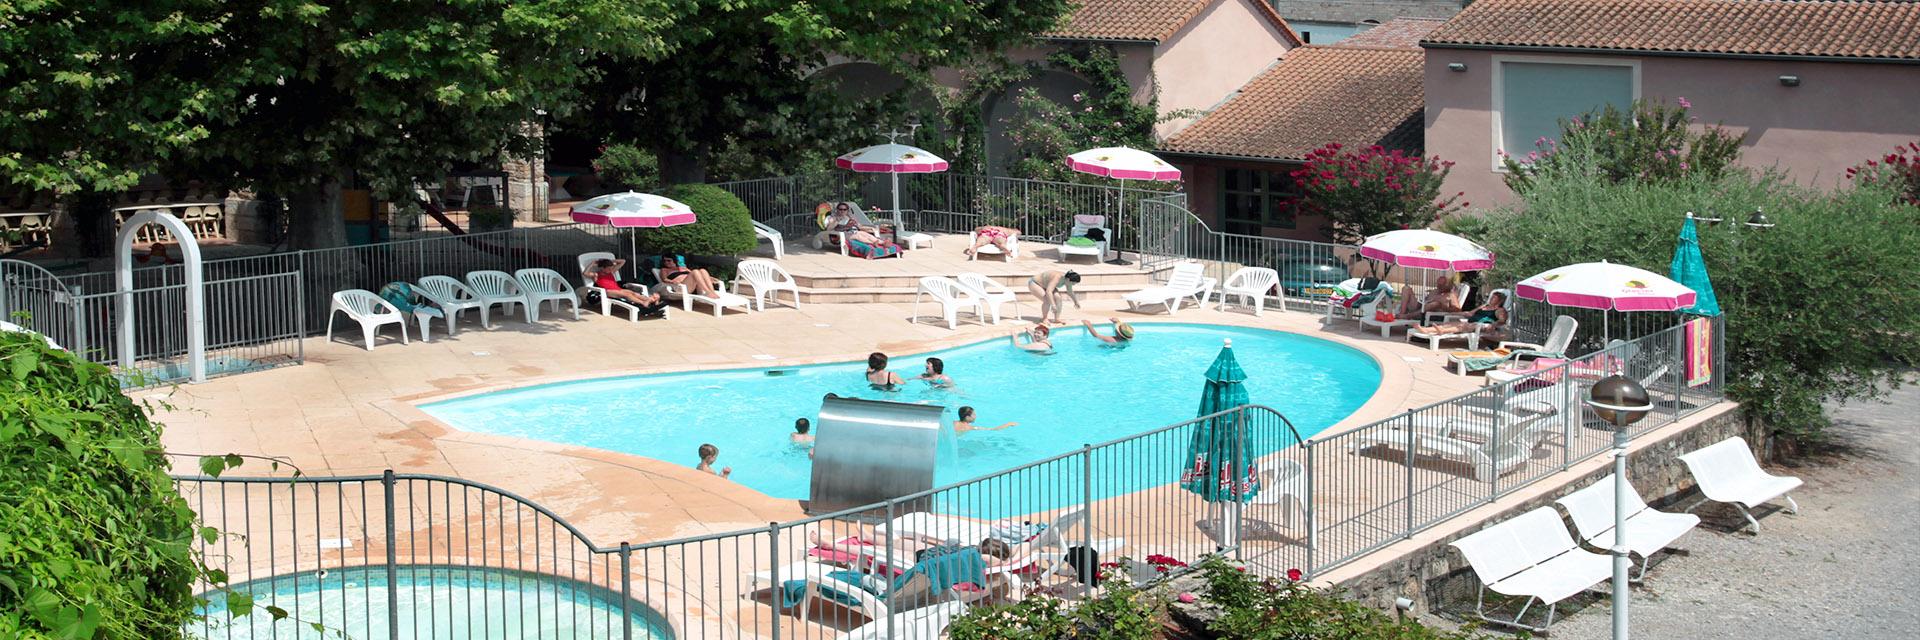 Village_club_vacances_aveyron-cantal-ardèche-au-gai-logis-piscine